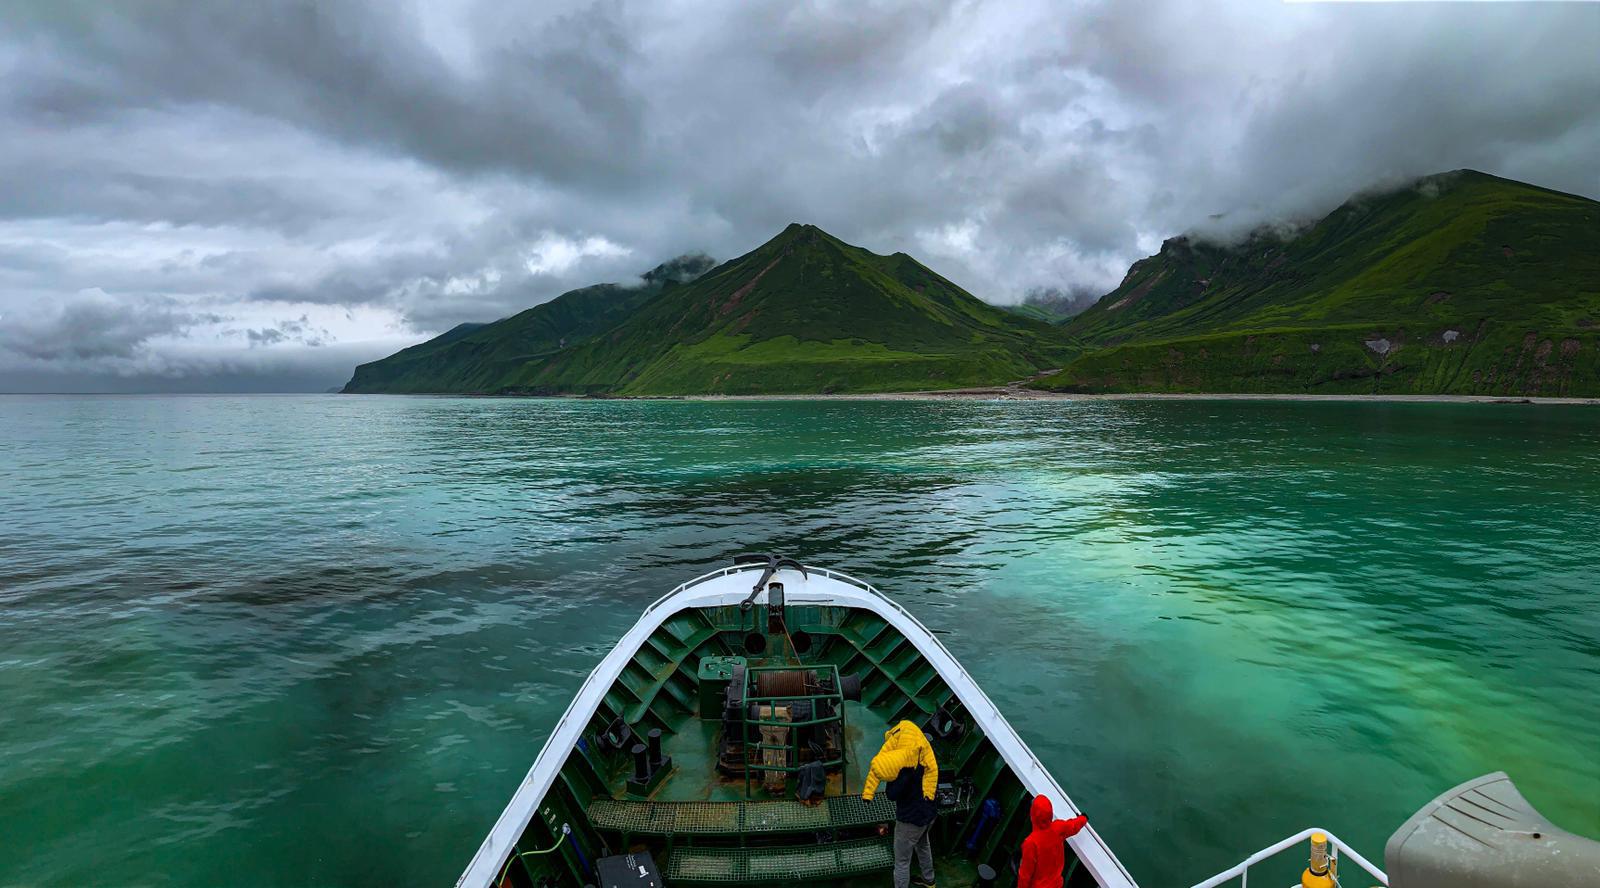 Kaspersky supporta la spedizione alle isole Kuril